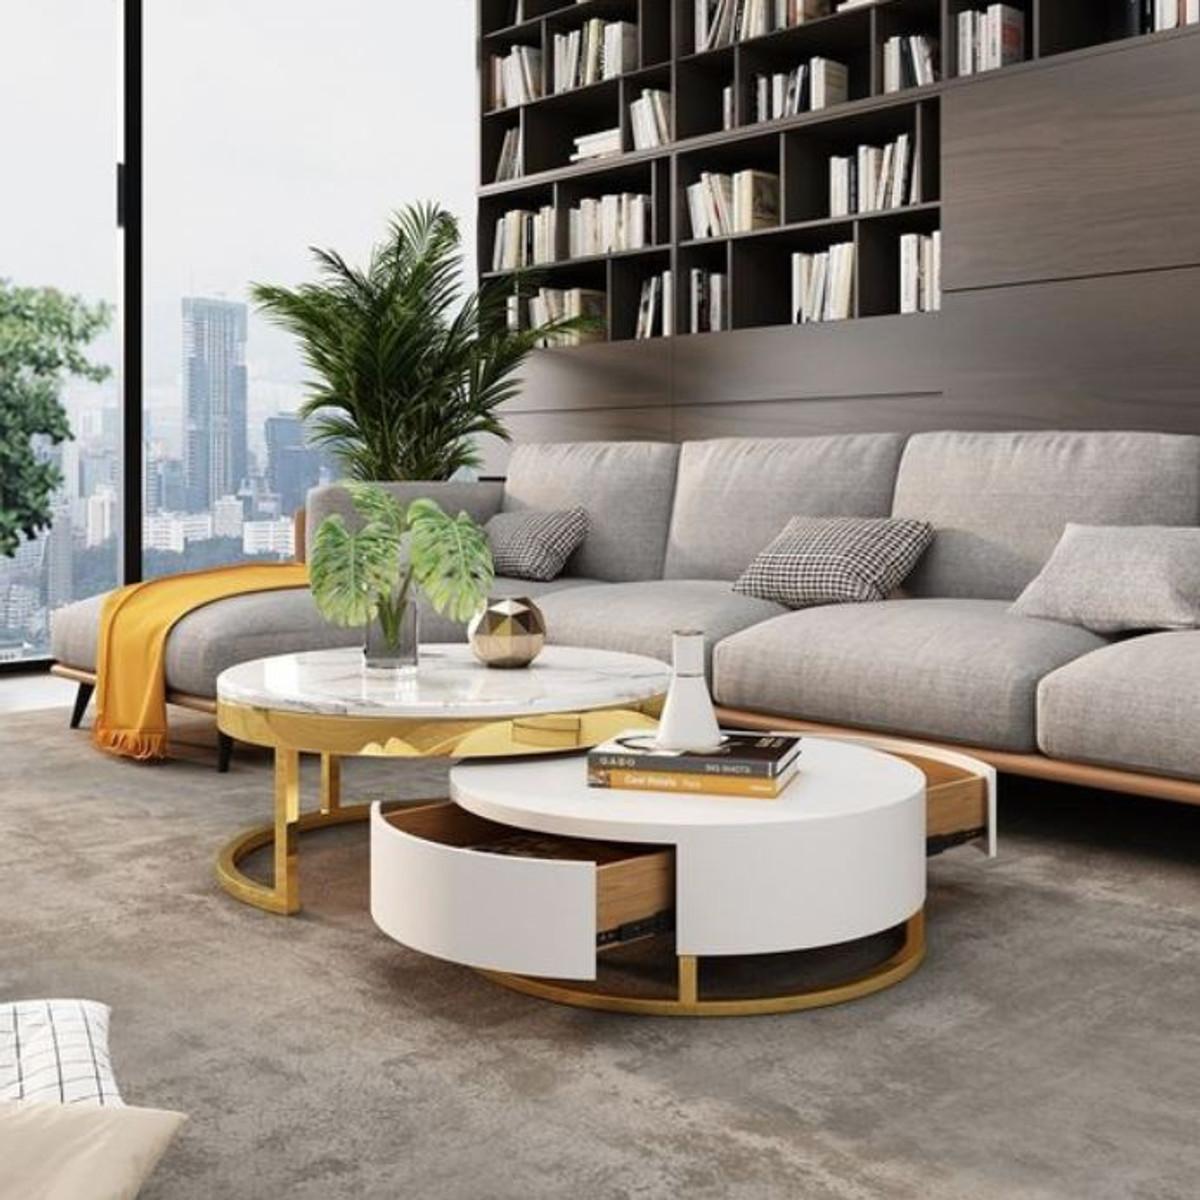 Casa Padrino Luxury Coffee Table Set, Living Room Table Set